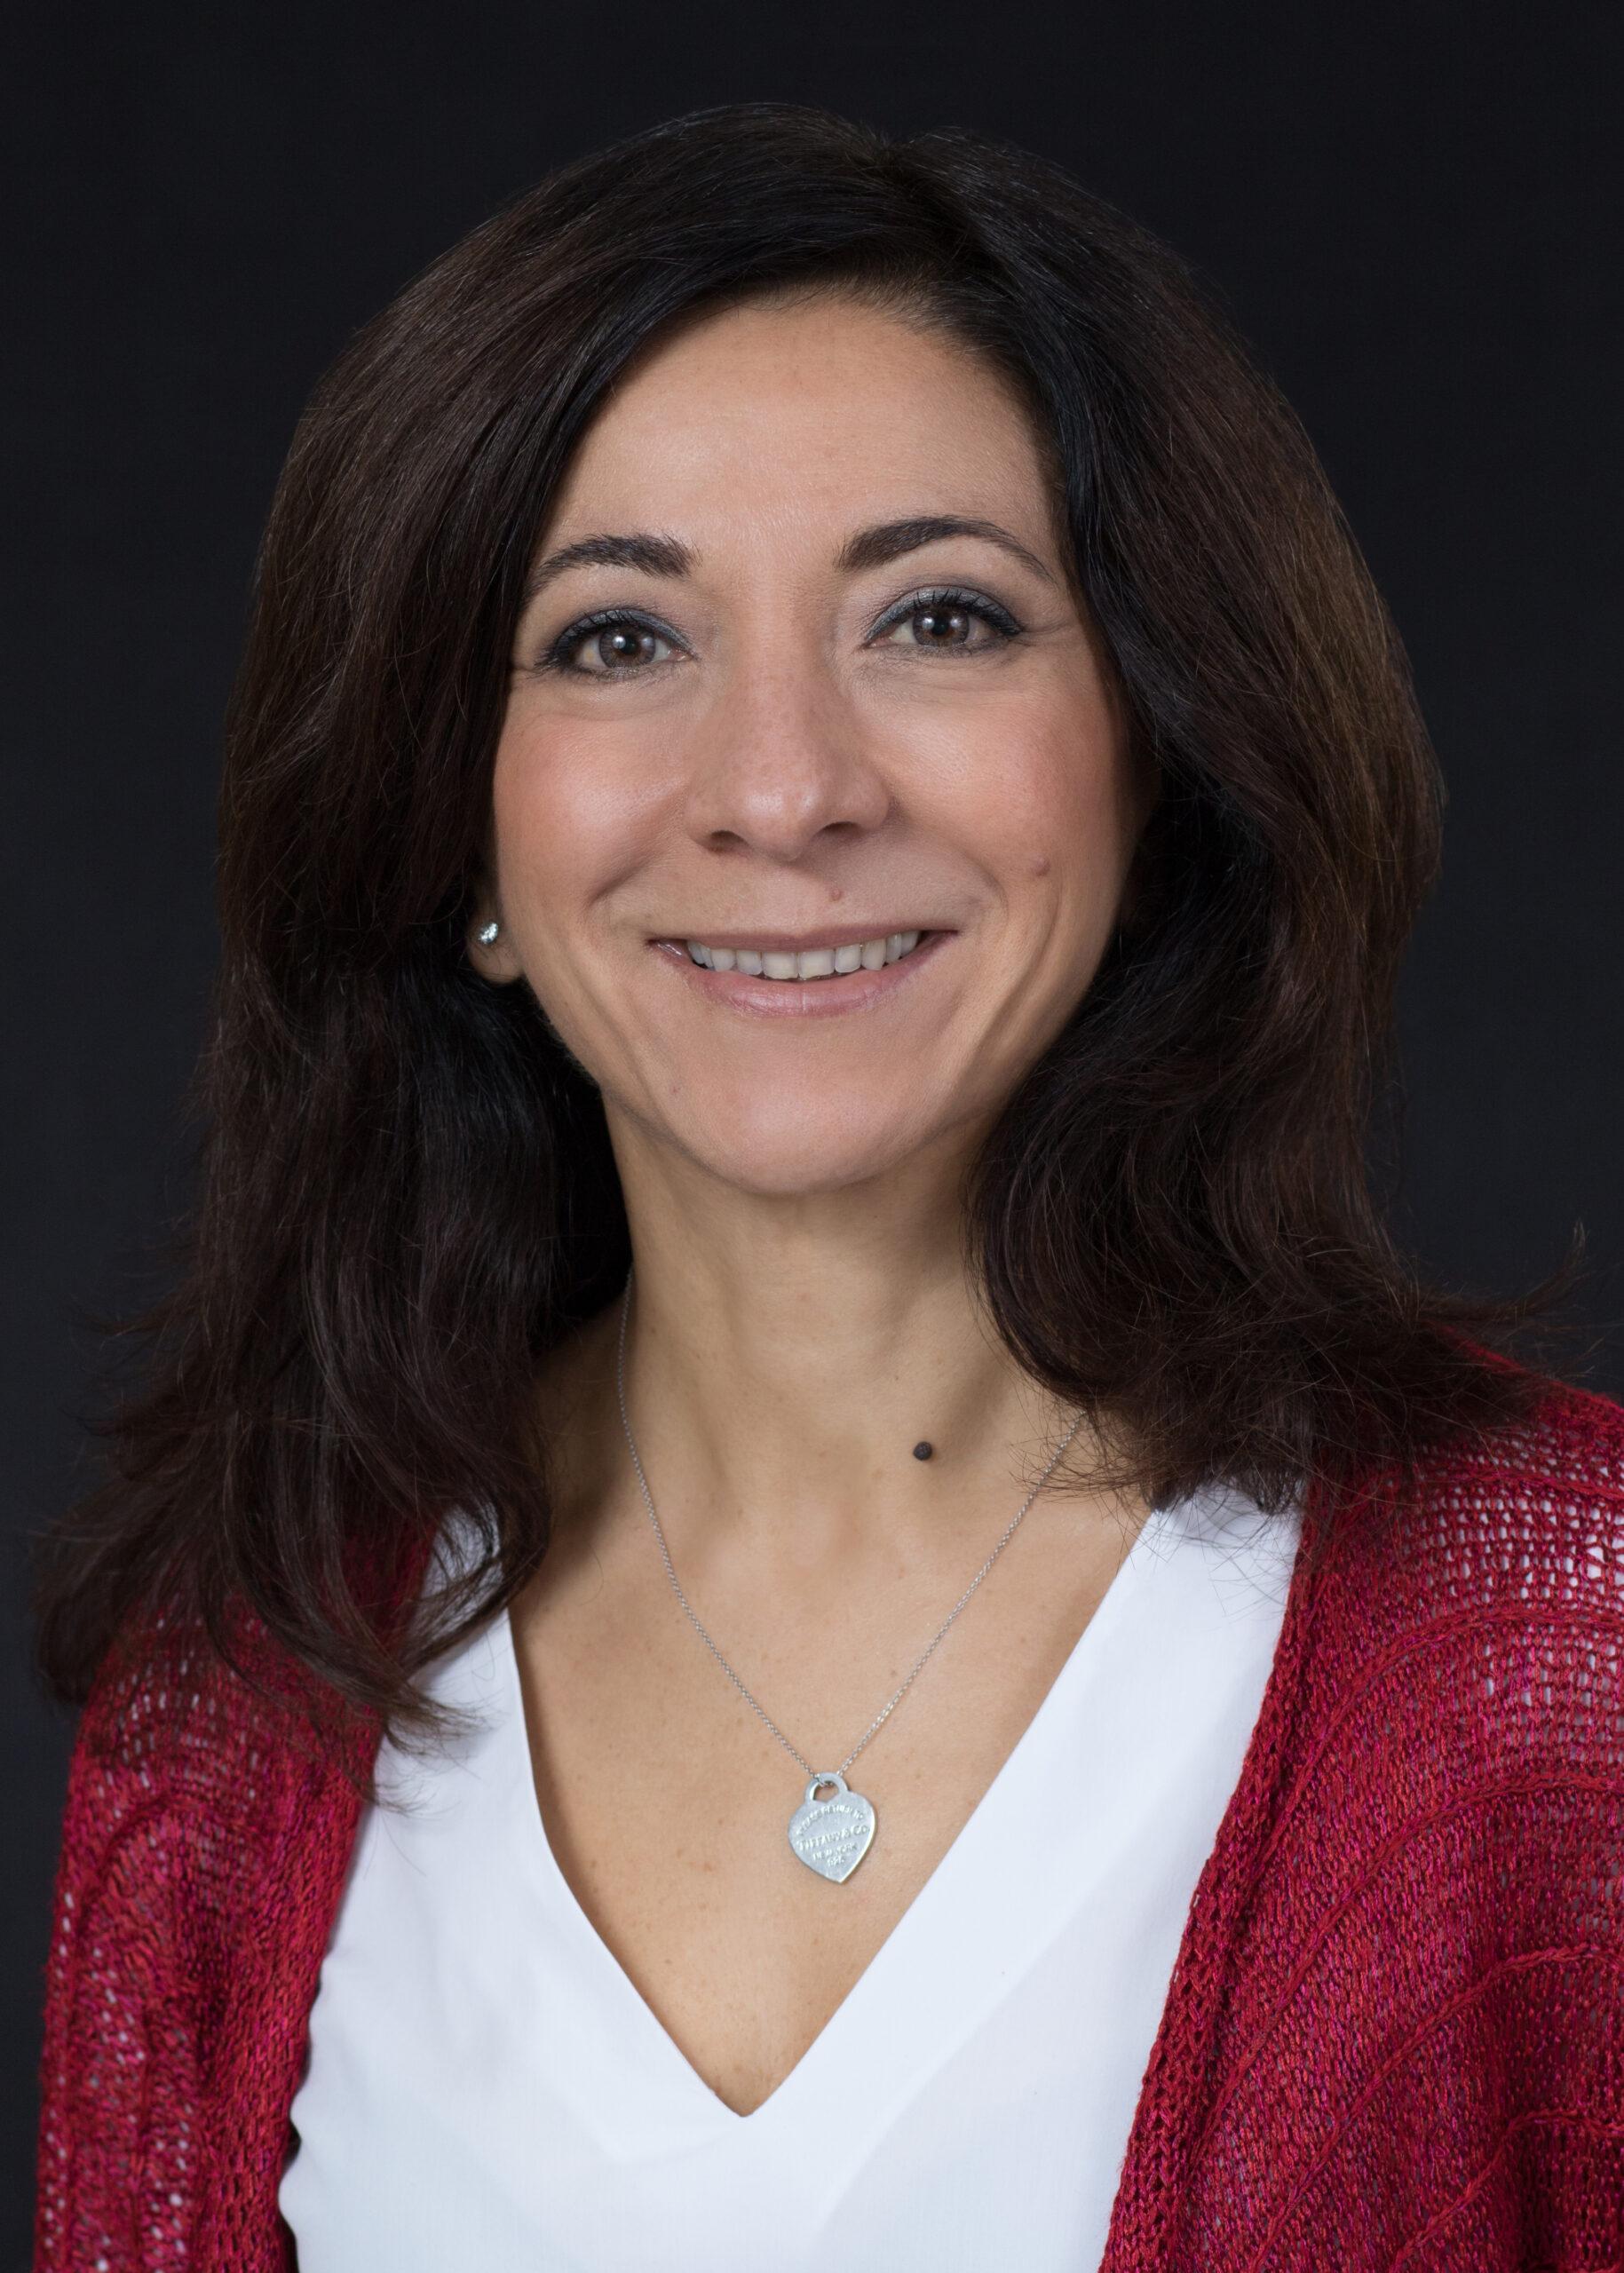 Maria-Antonietta-DAgostino-Final